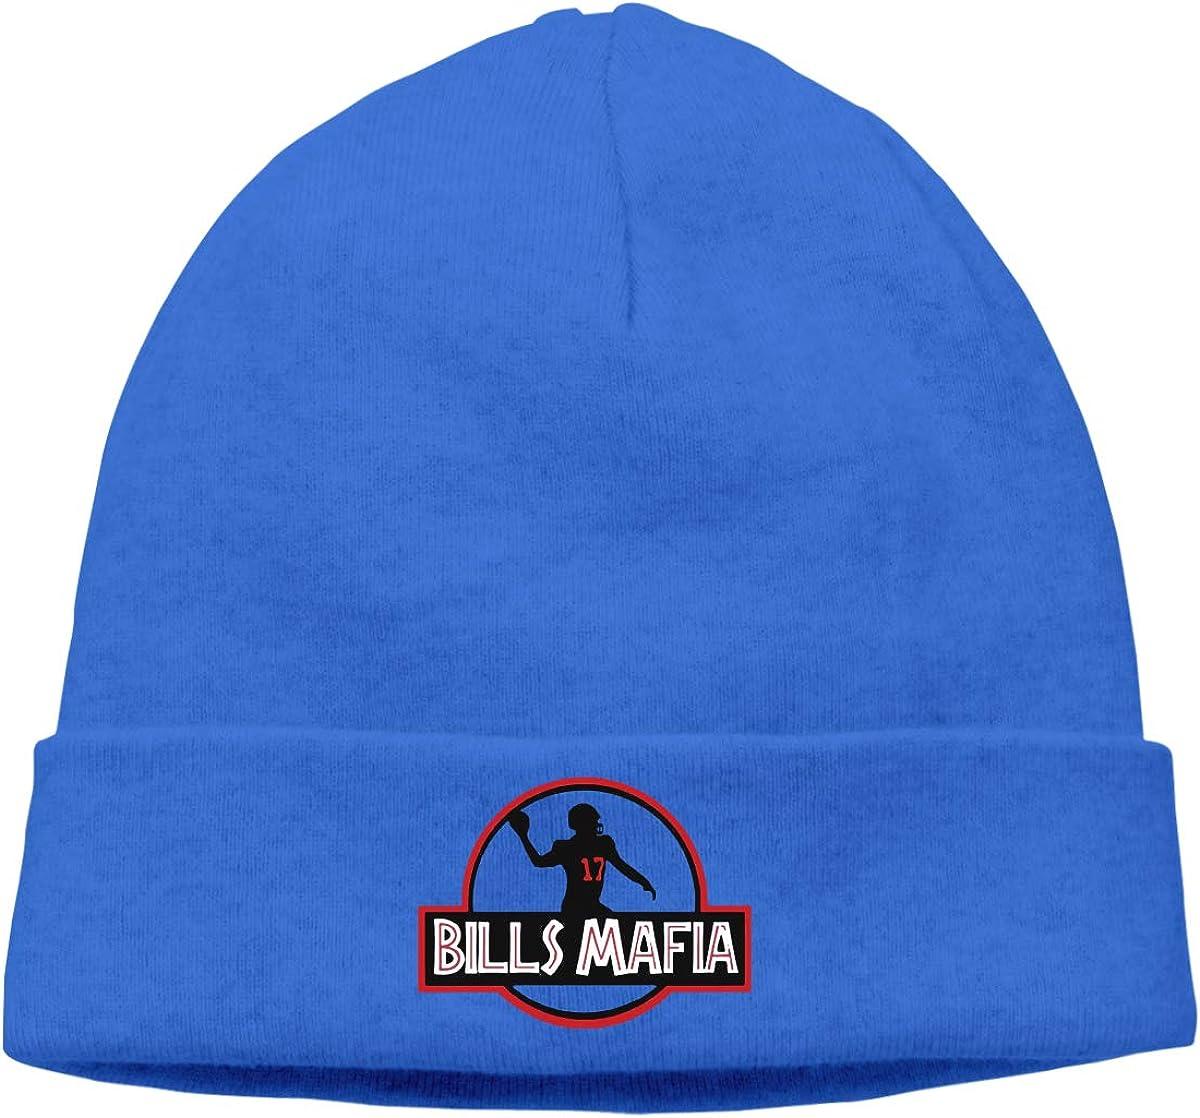 Moore Me Mens Winter Warm Beanie Hats Blue Bills Mafia Logo Slouchy Beanie for Women